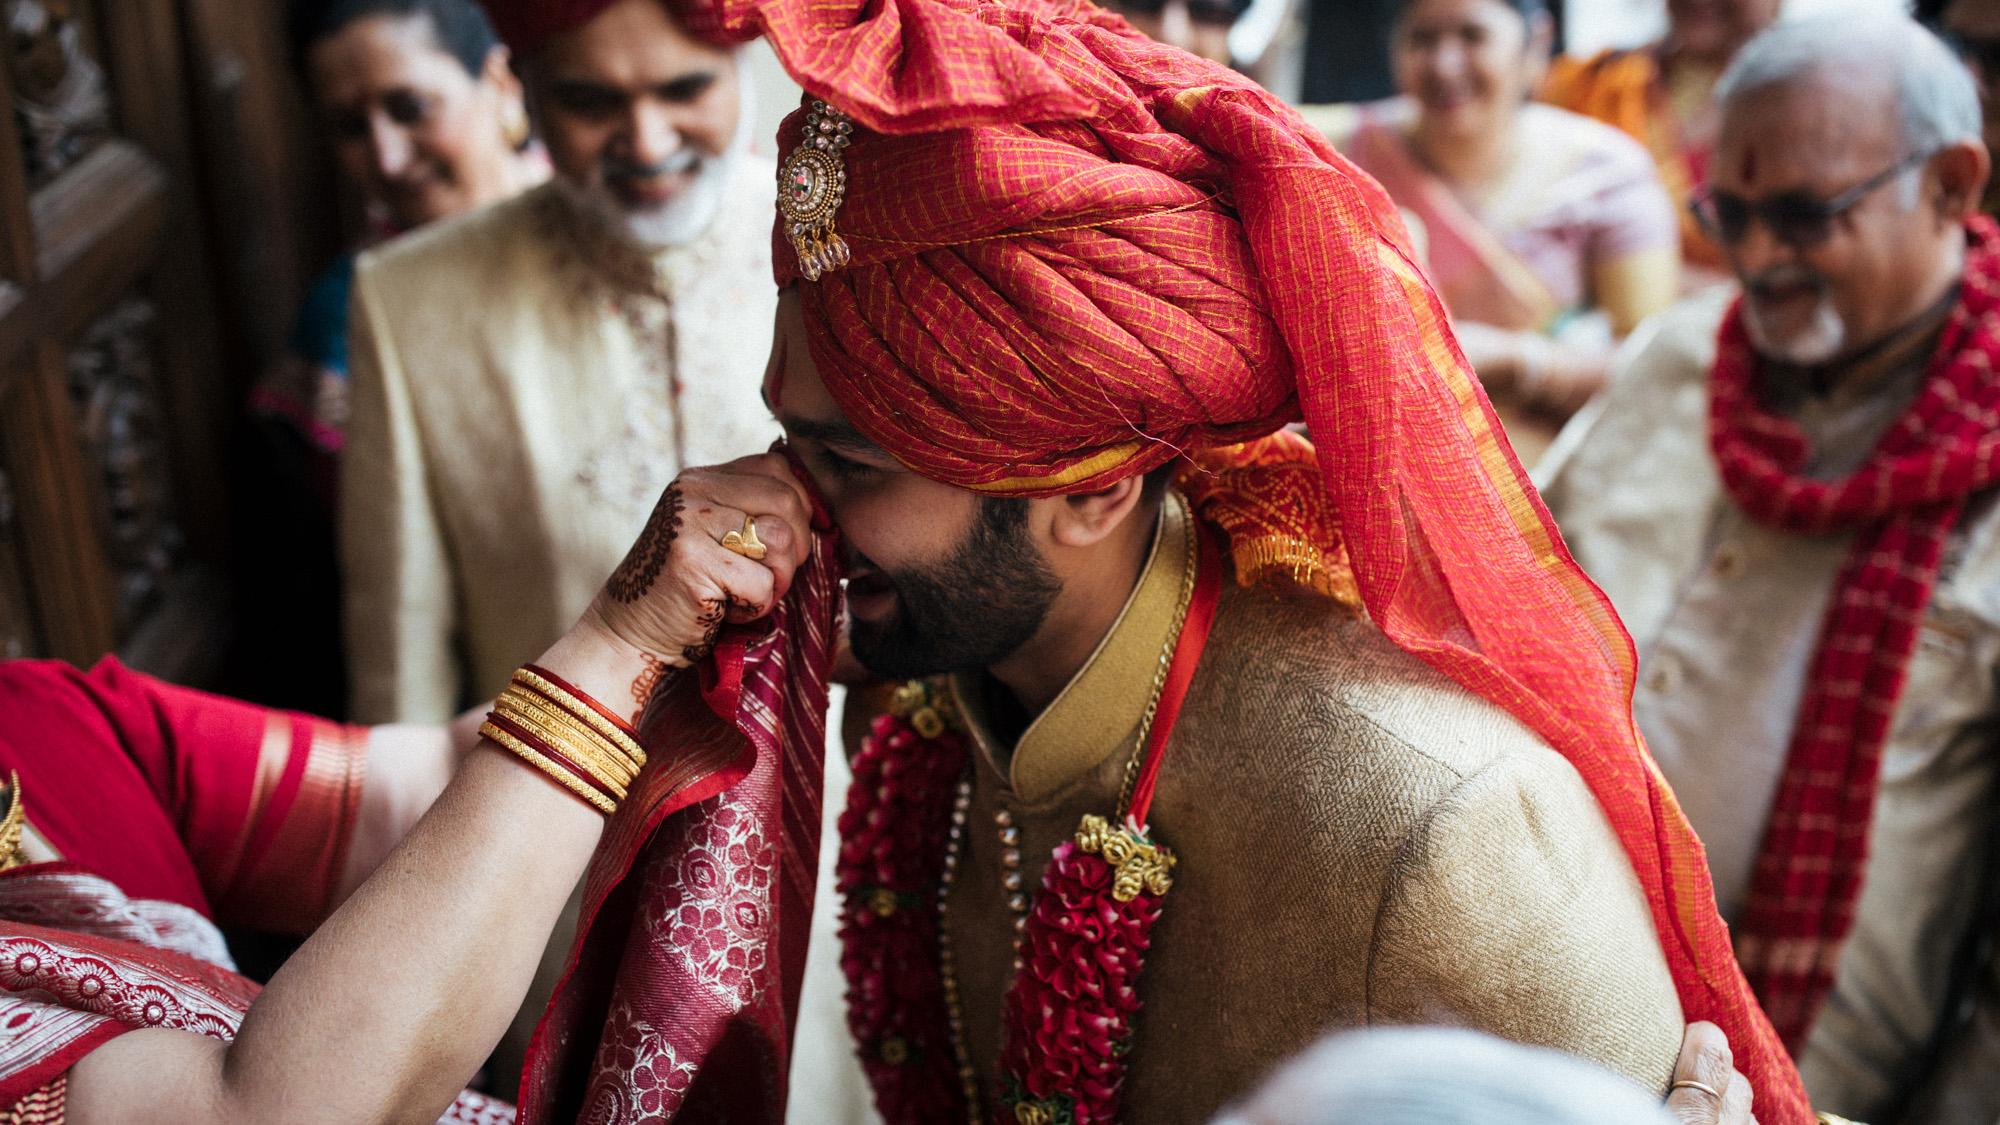 anu_maneesh_alec_vanderboom_Indian_wedding_photography-0087.jpg